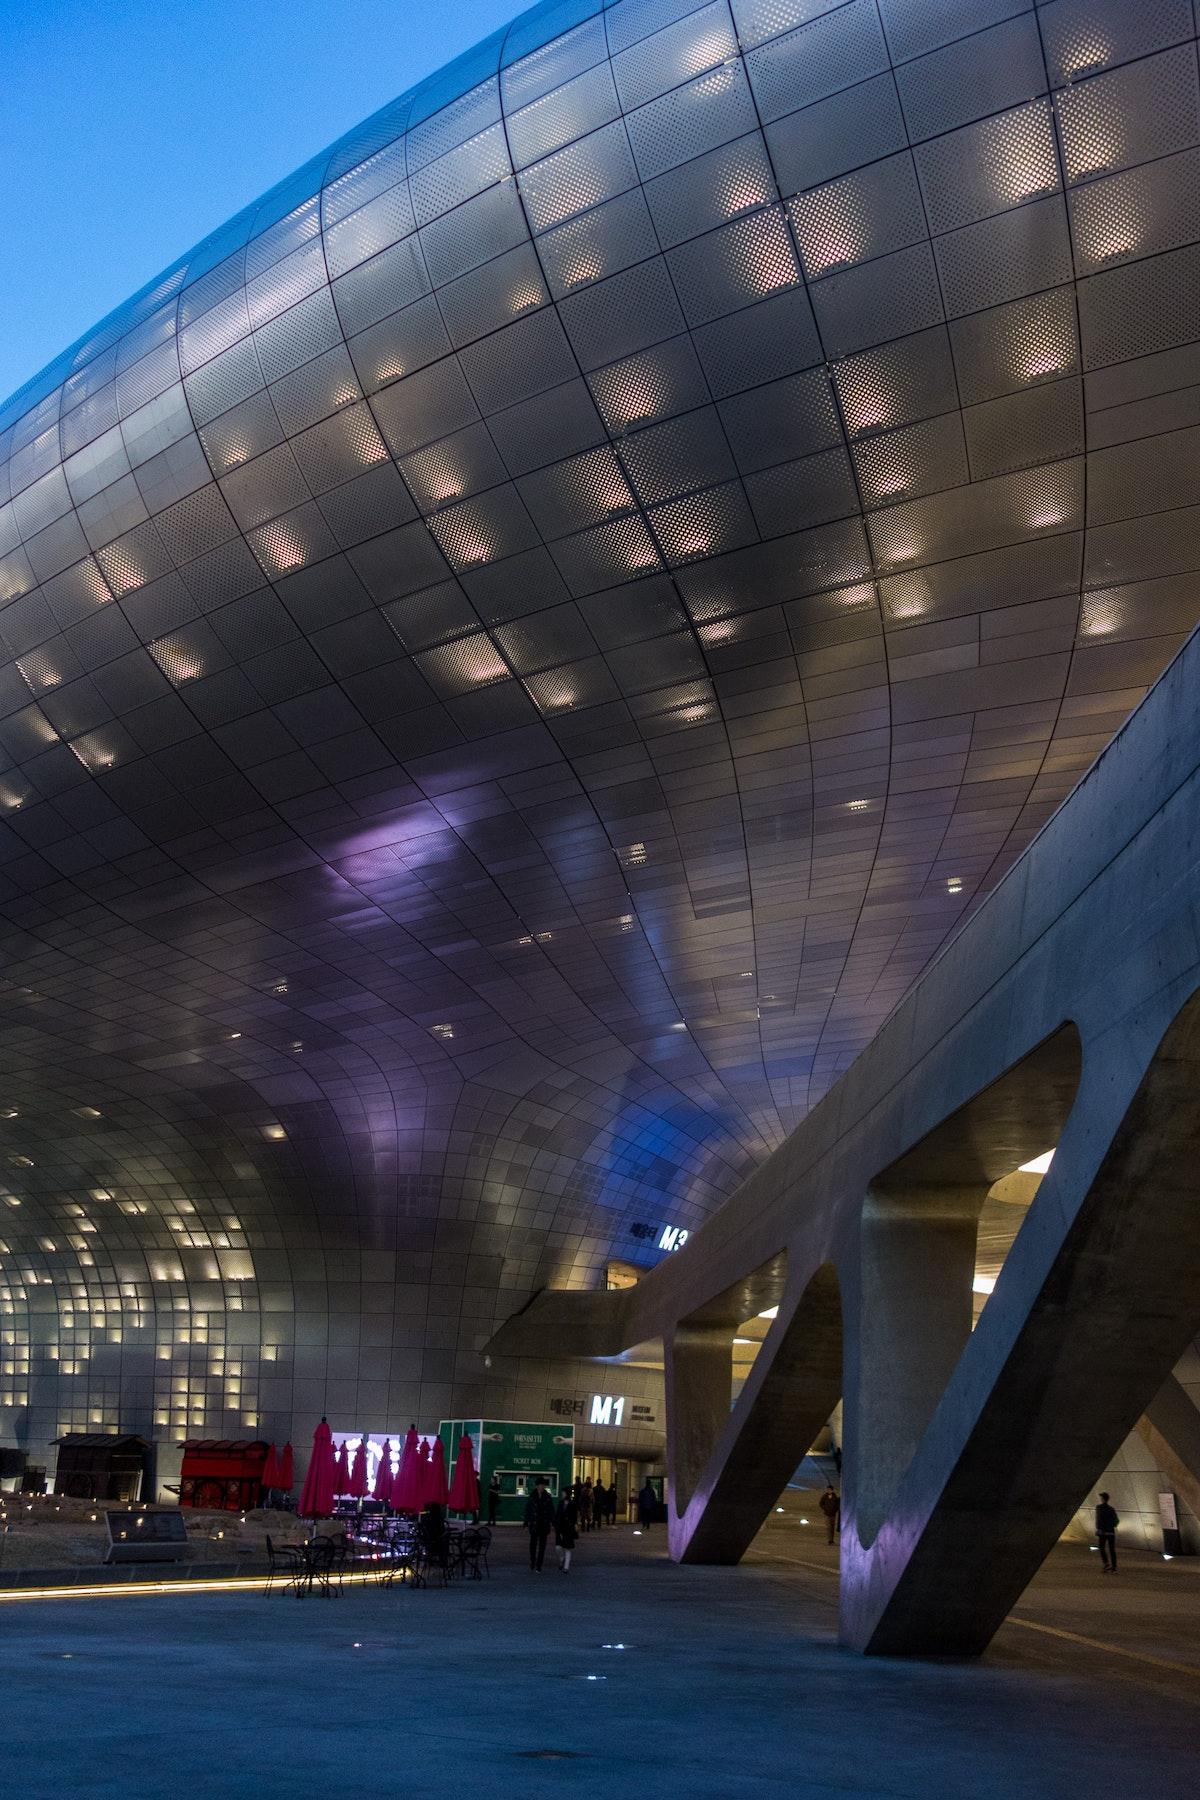 Dongdaemun Design Plaza - Subtle illumination of the building skin